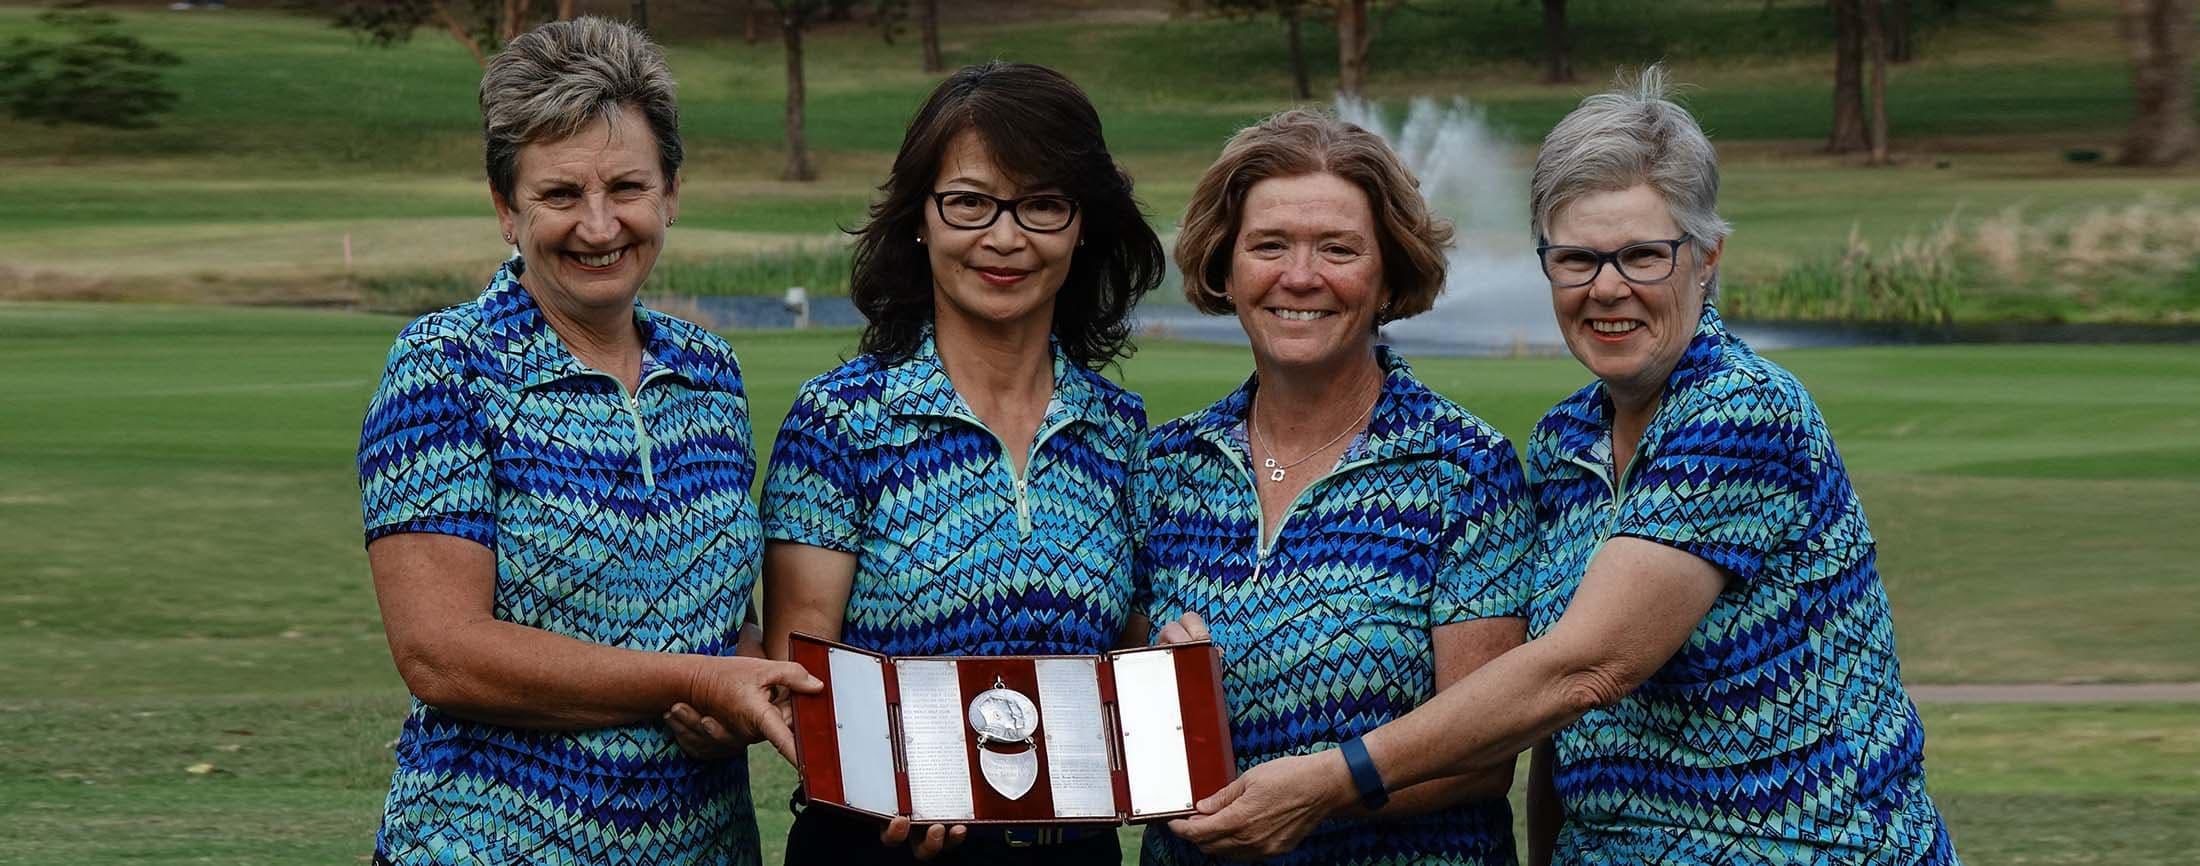 2017 Coronation Medal Winners - Pymble GC